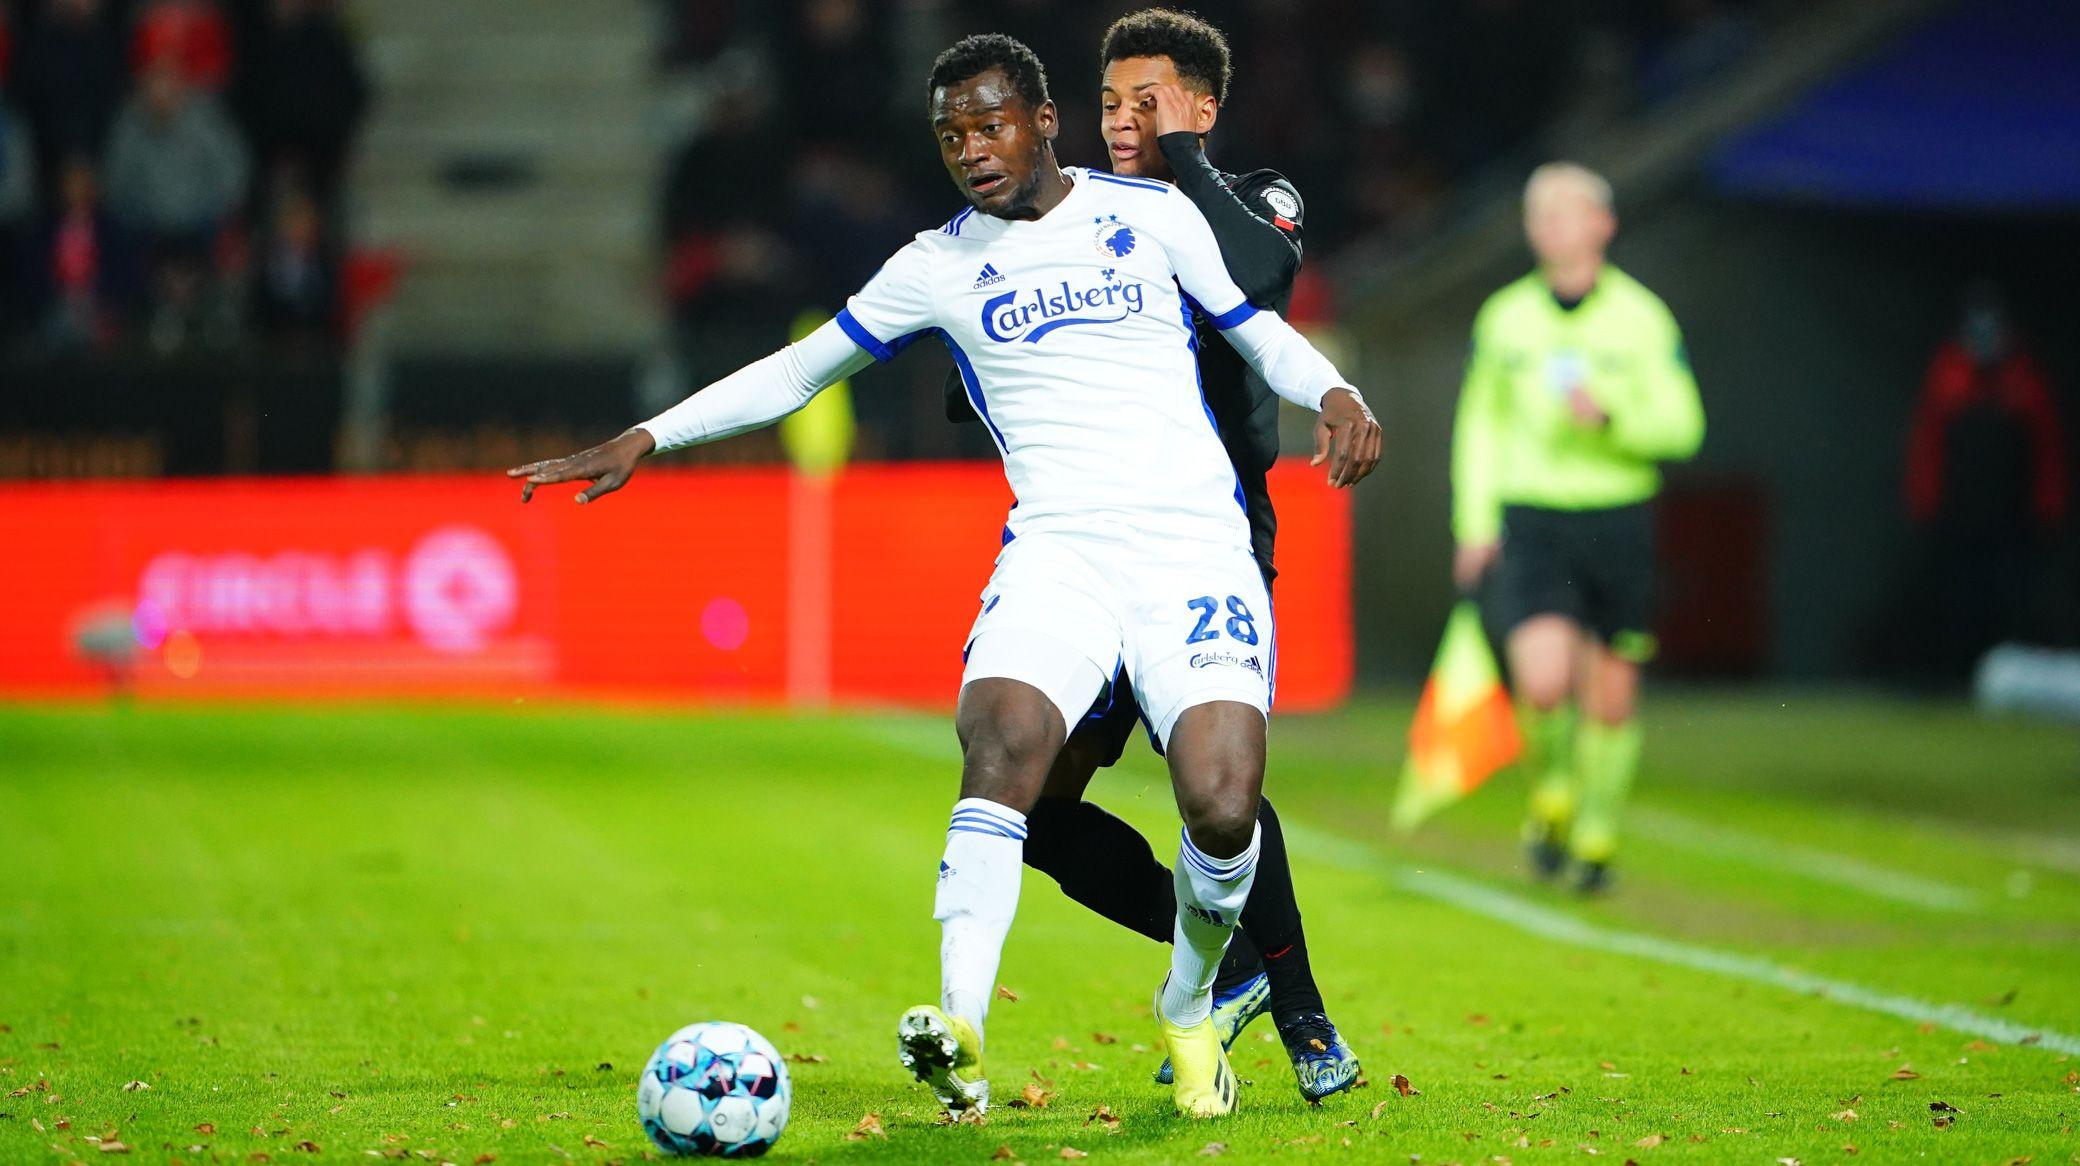 Attacker Bundu ends goal drought in defeat to Midtjylland